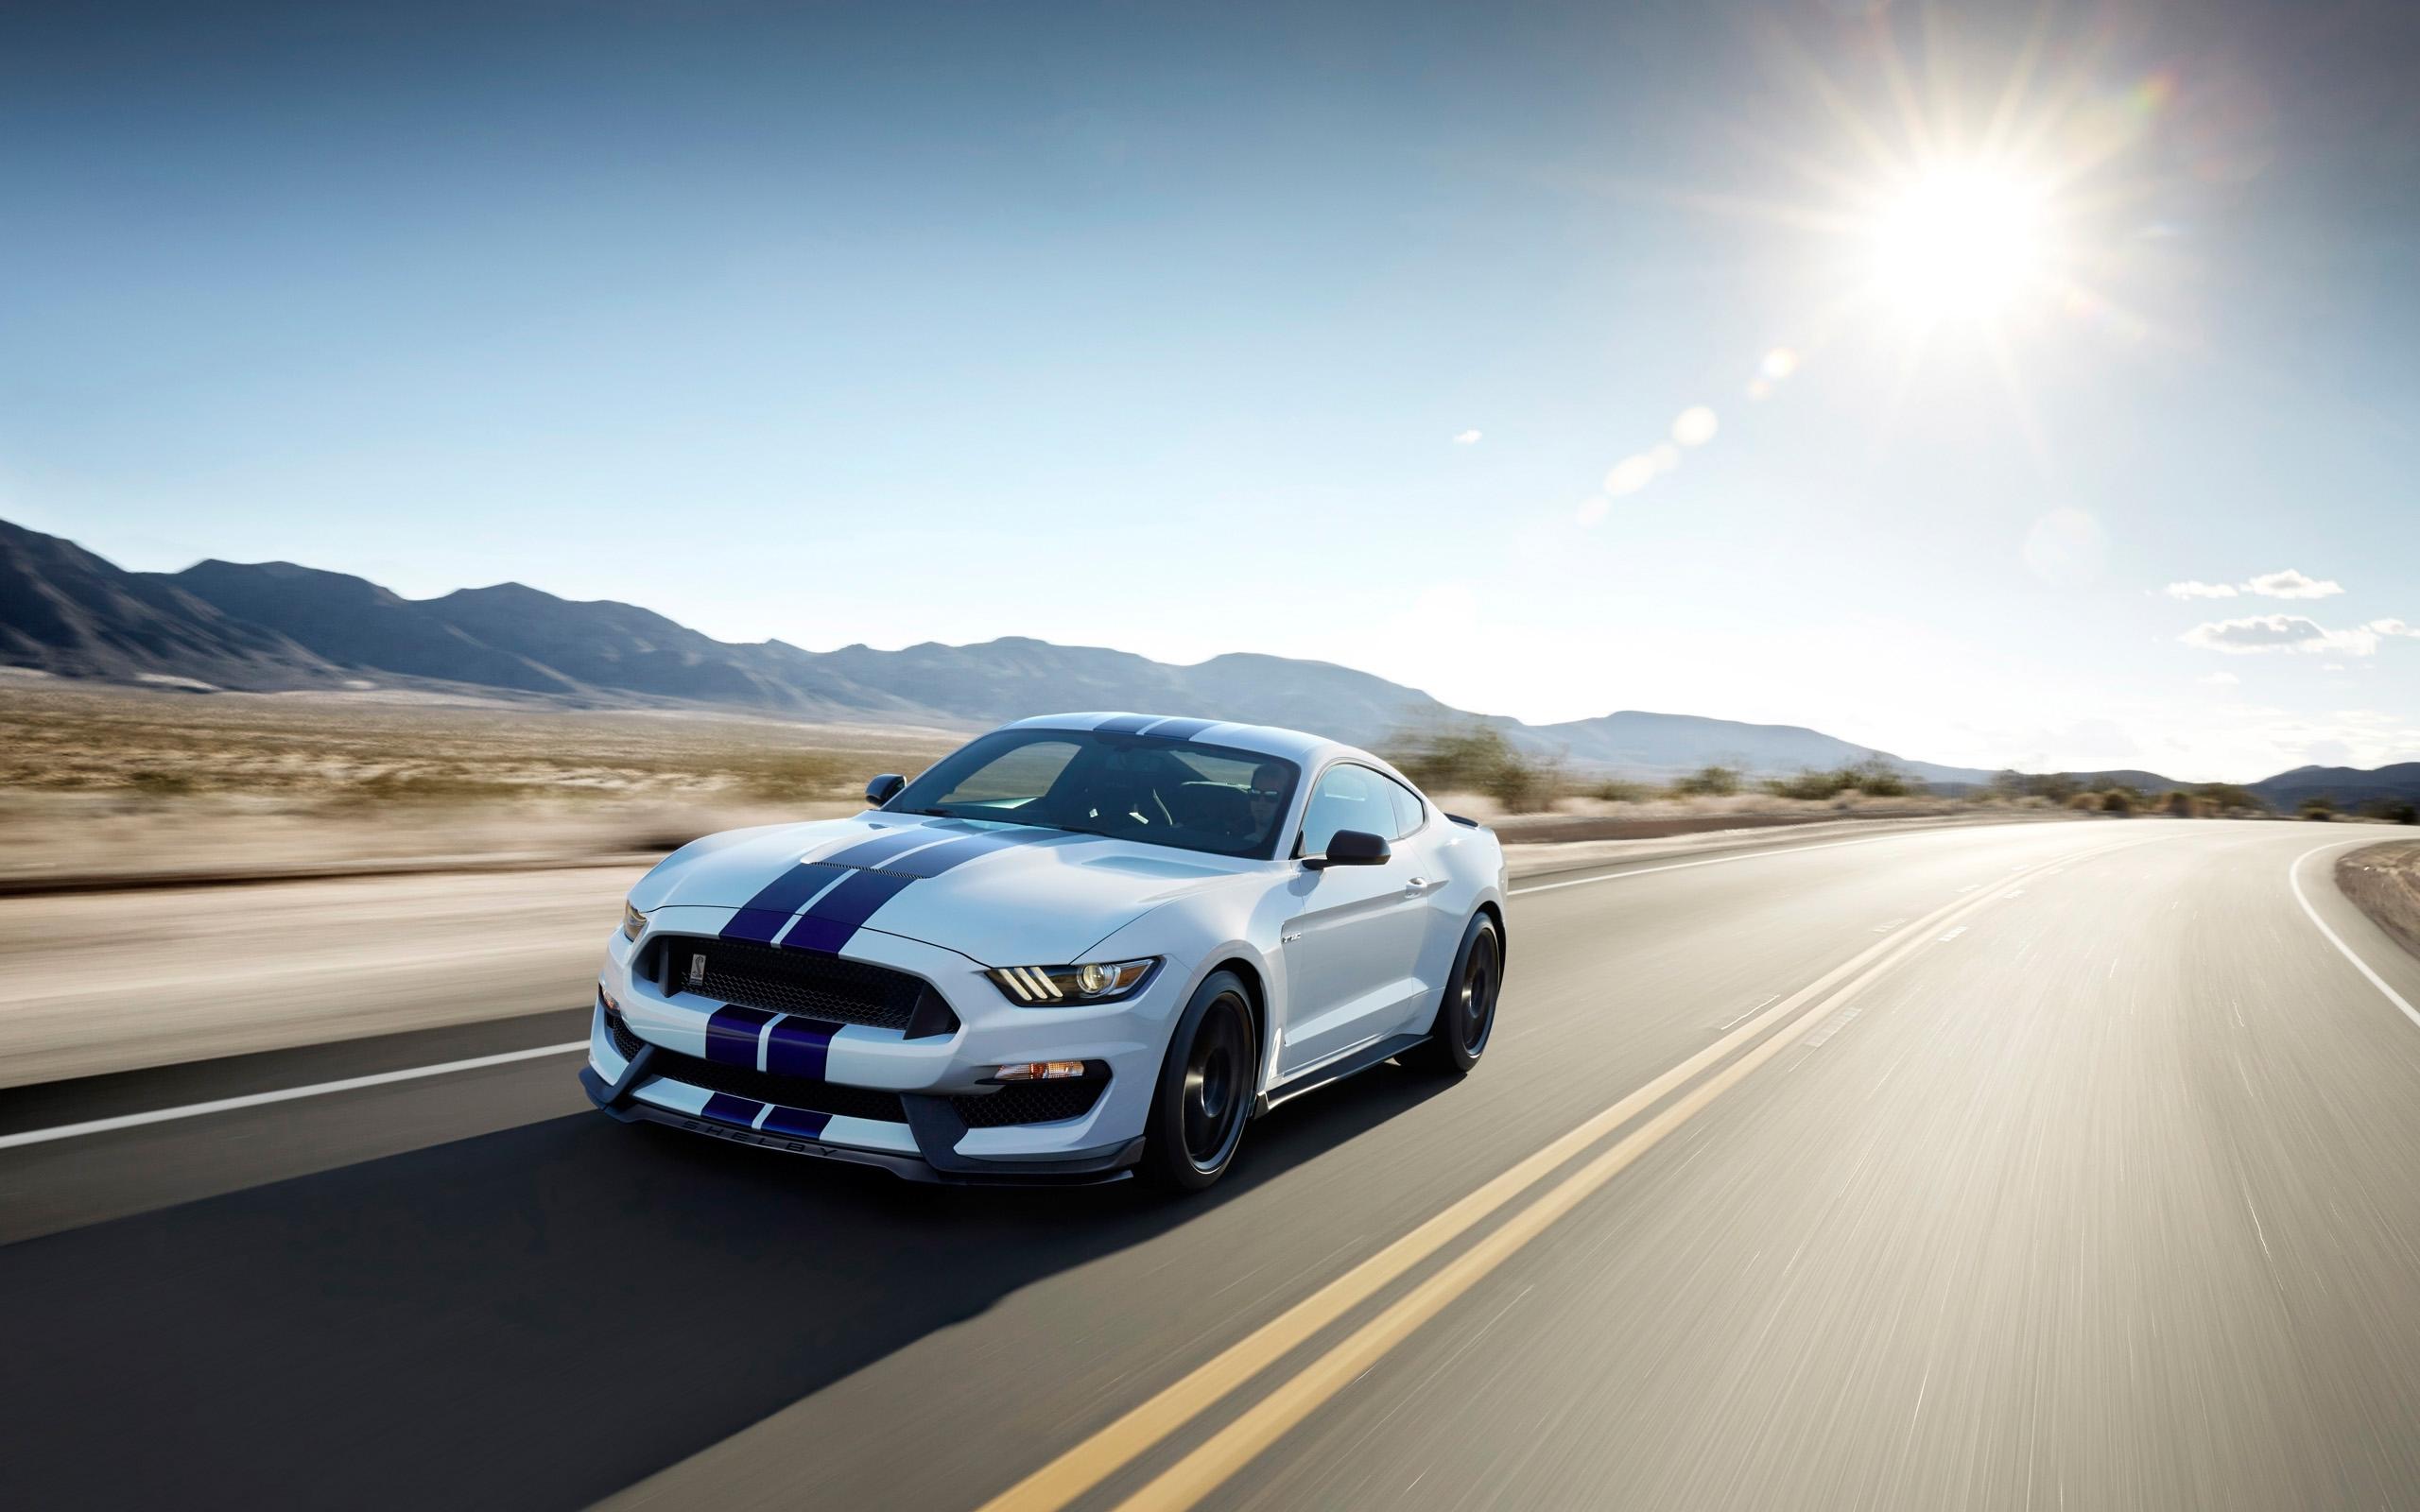 2015 Ford Shelby GT350 Mustang Desktop HD Wallpaper 2560x1600